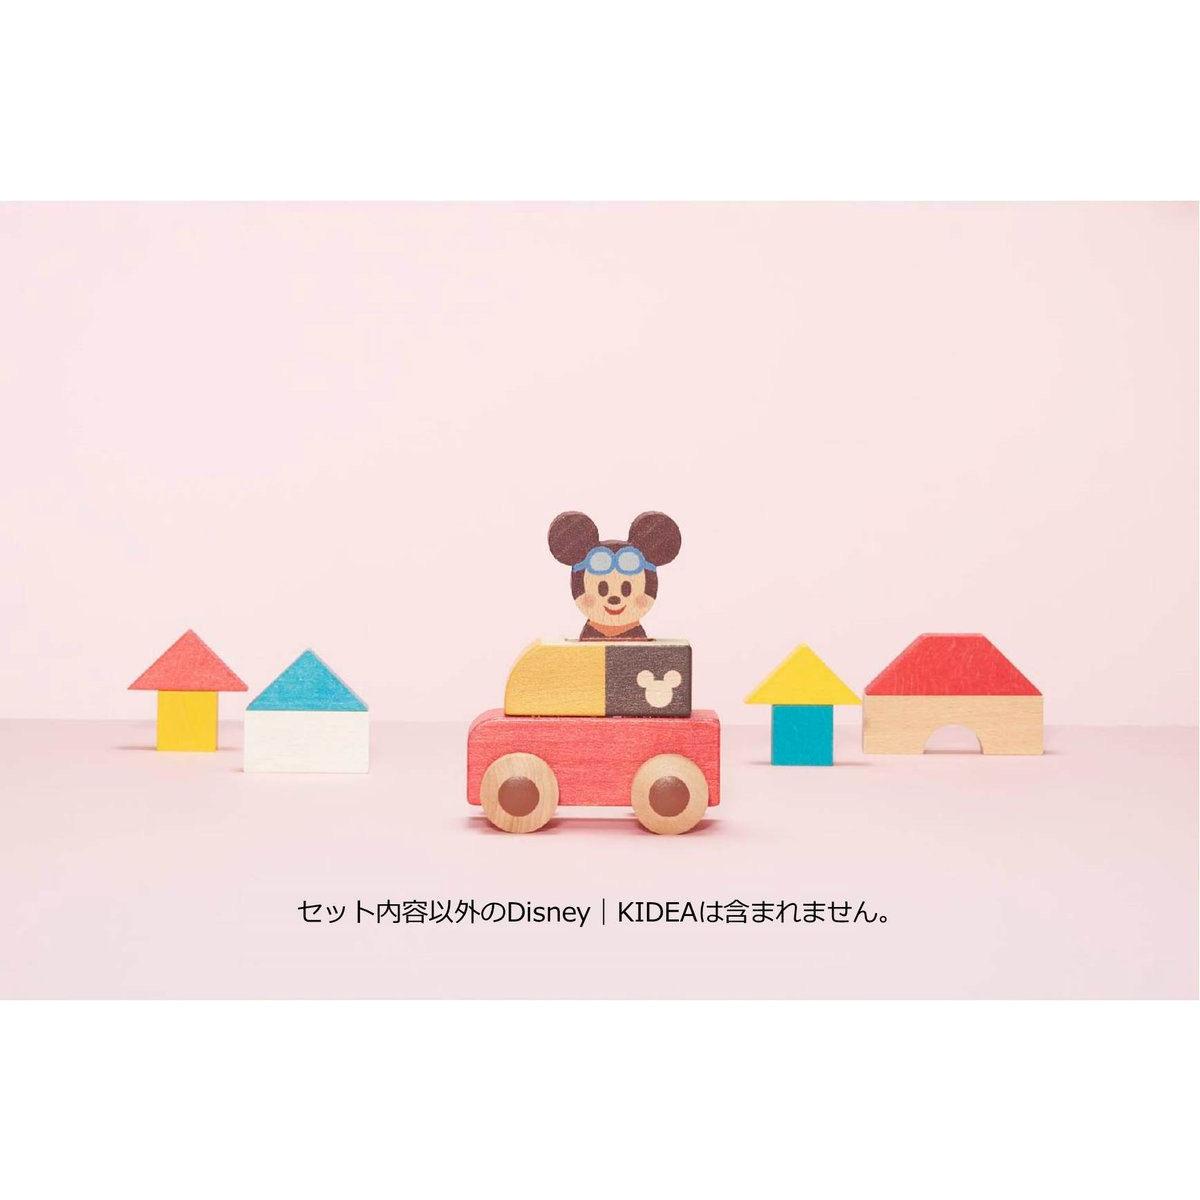 disney | kidea push car <ミッキーマウス> | ディズニーキャラクター